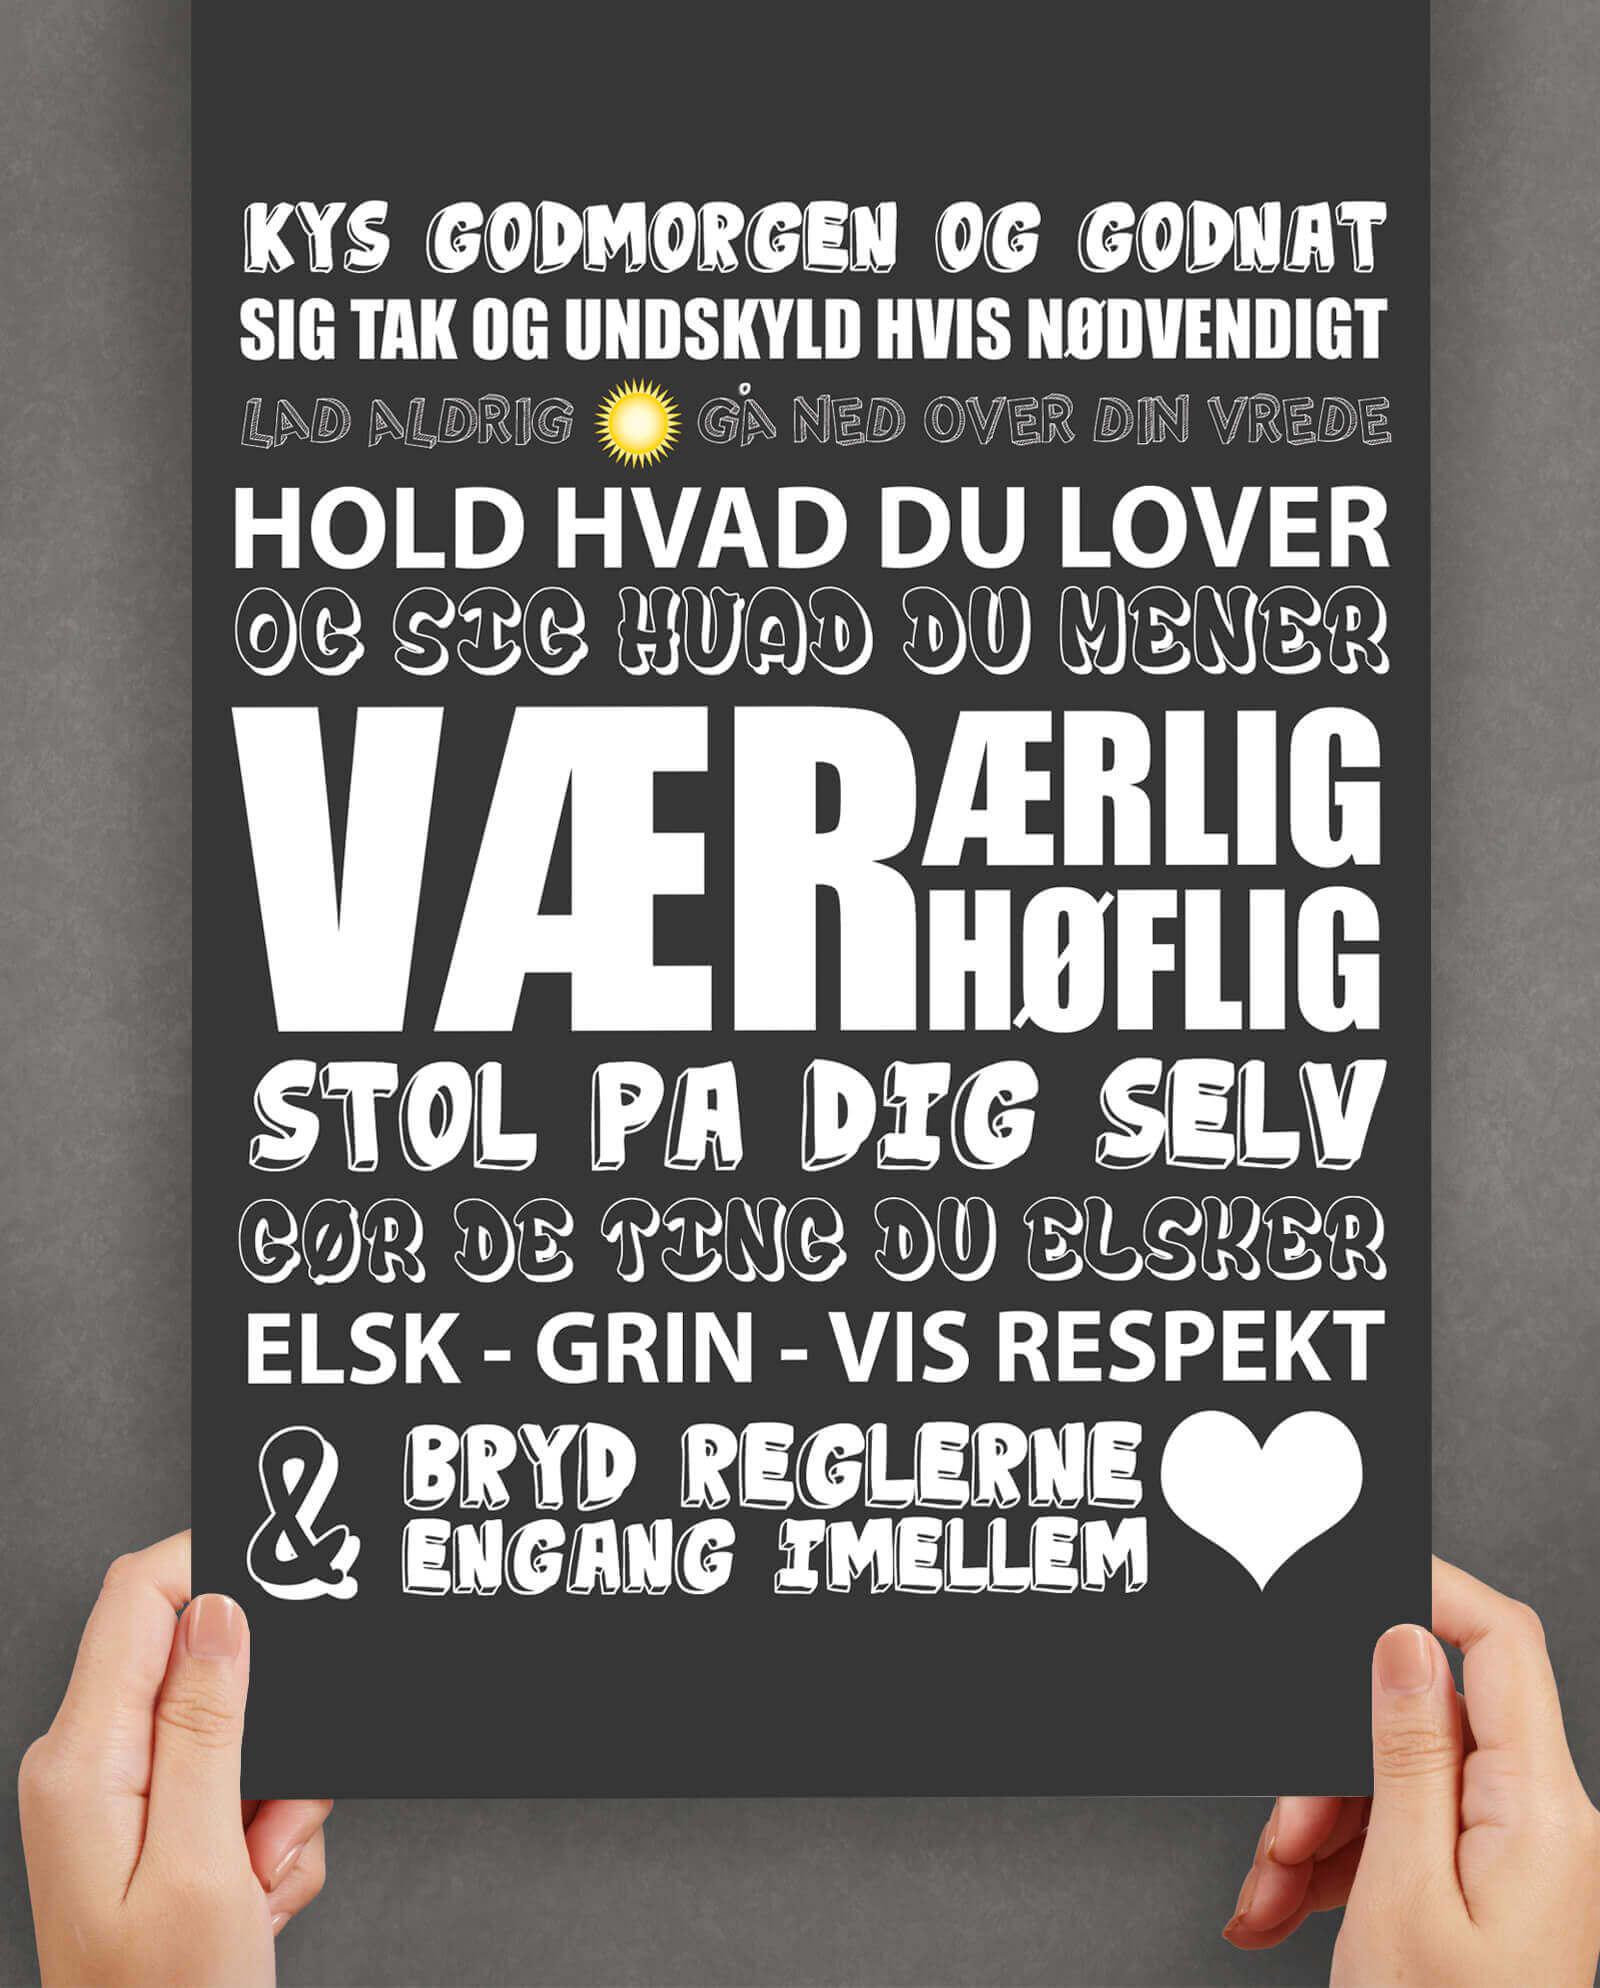 Kys-godtmorgen-sort-plakat